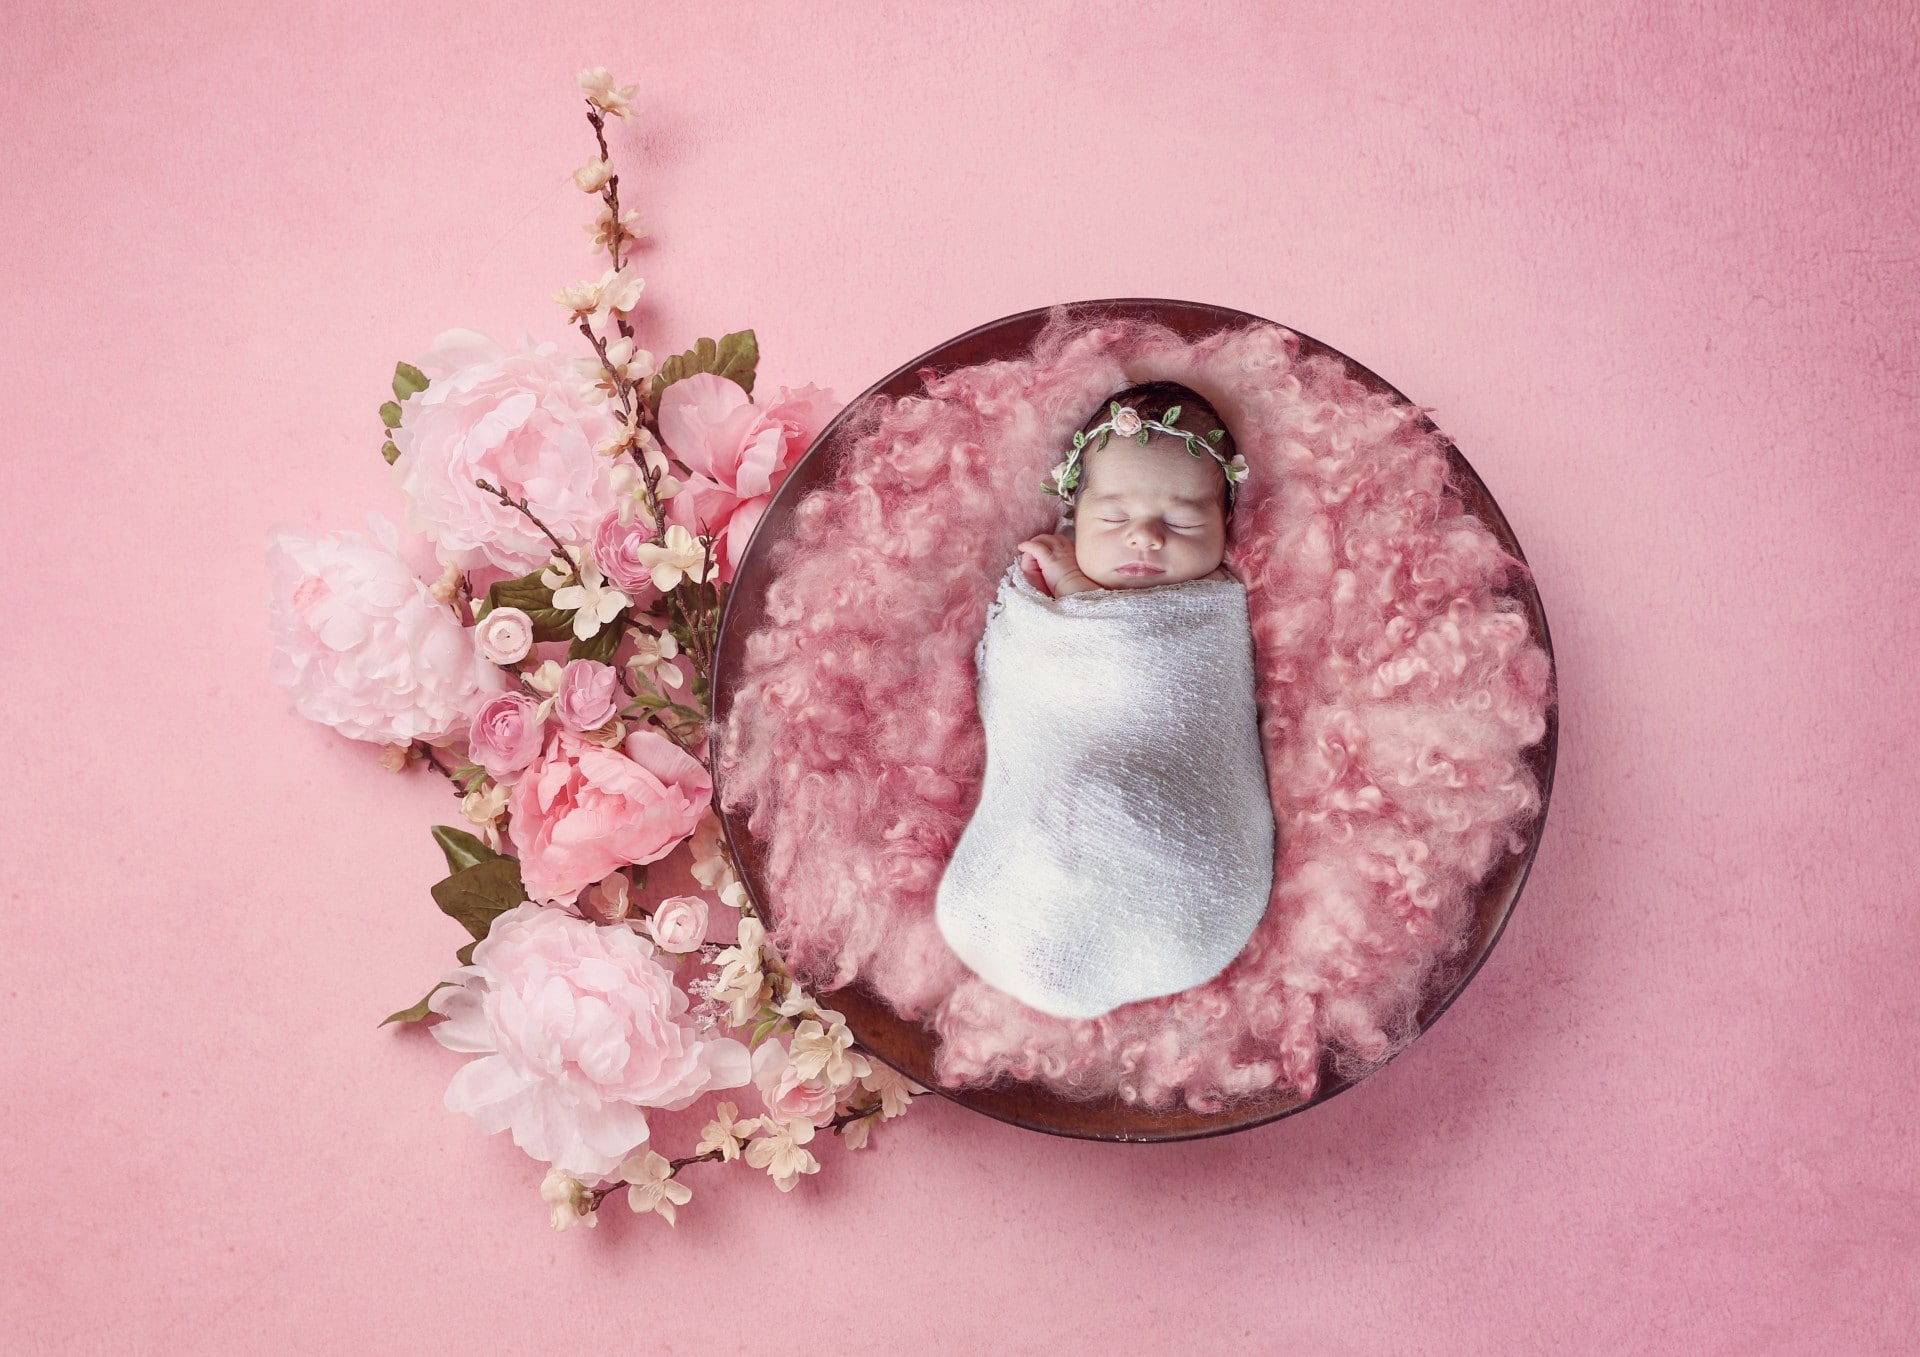 133-Tania-Flores-Photography-Babyfotos-DVwPDiIG (1)